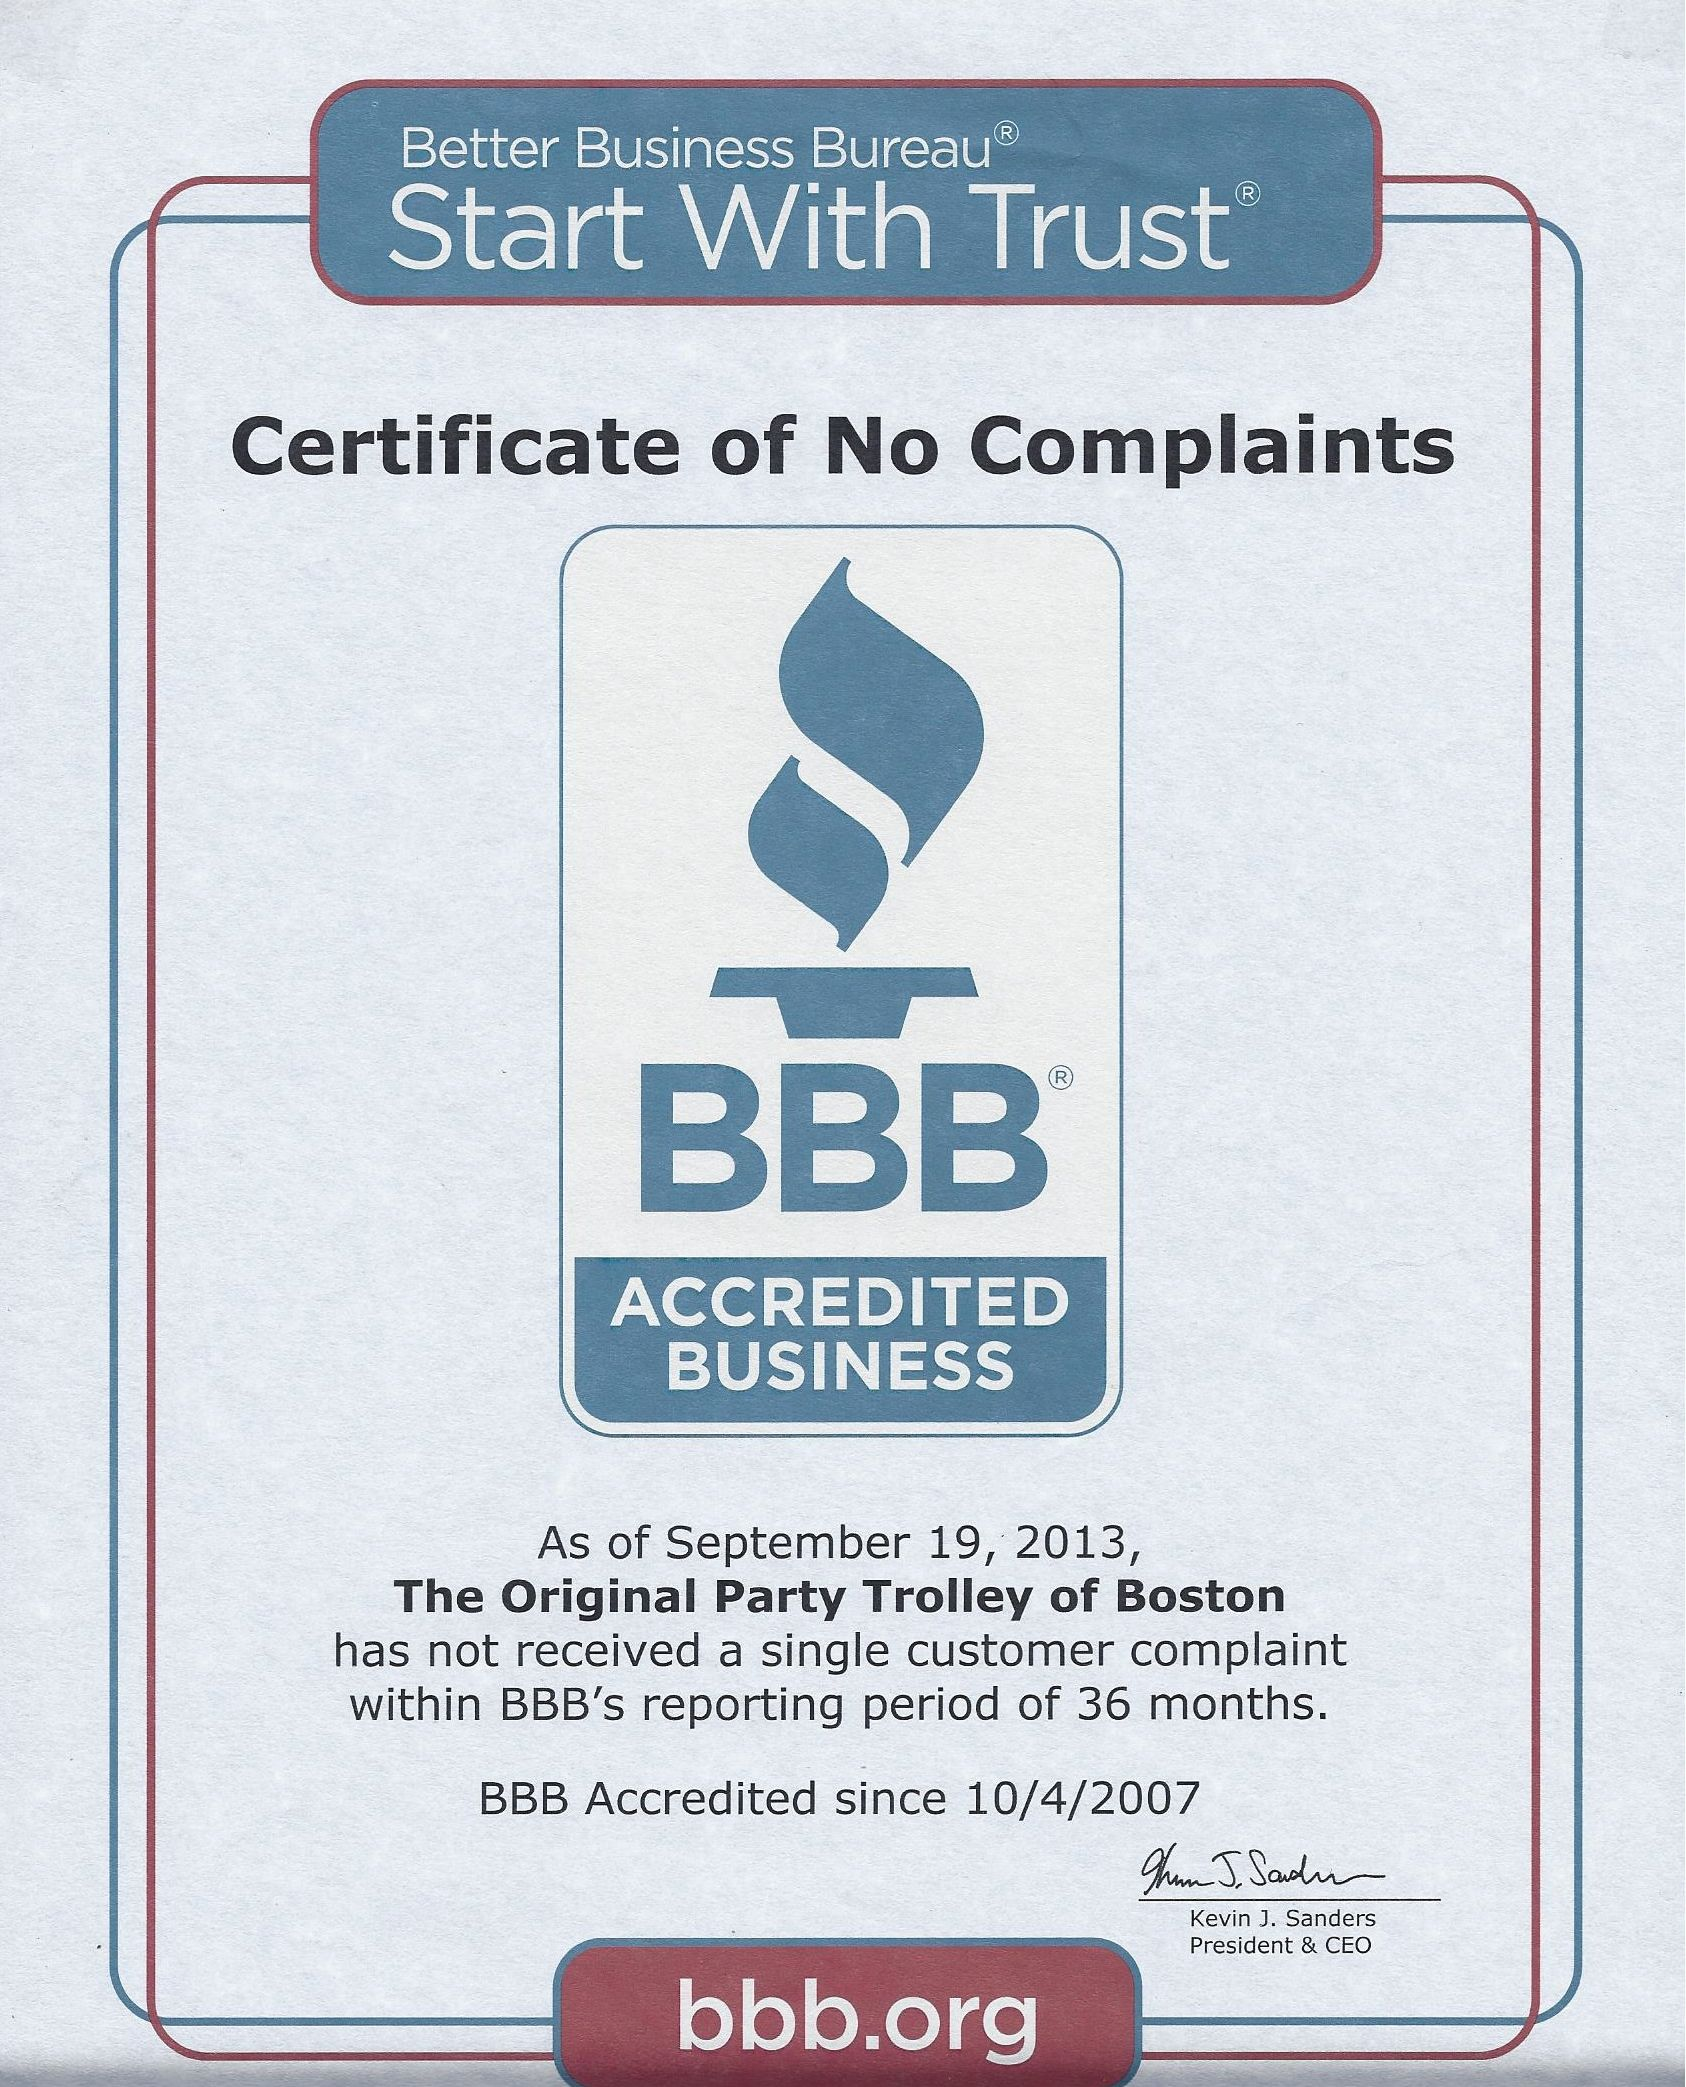 2013 Bbb Certificate Of No Complaints Hard Earned Certificate Of Achievement Customer Complaints Better Business Bureau